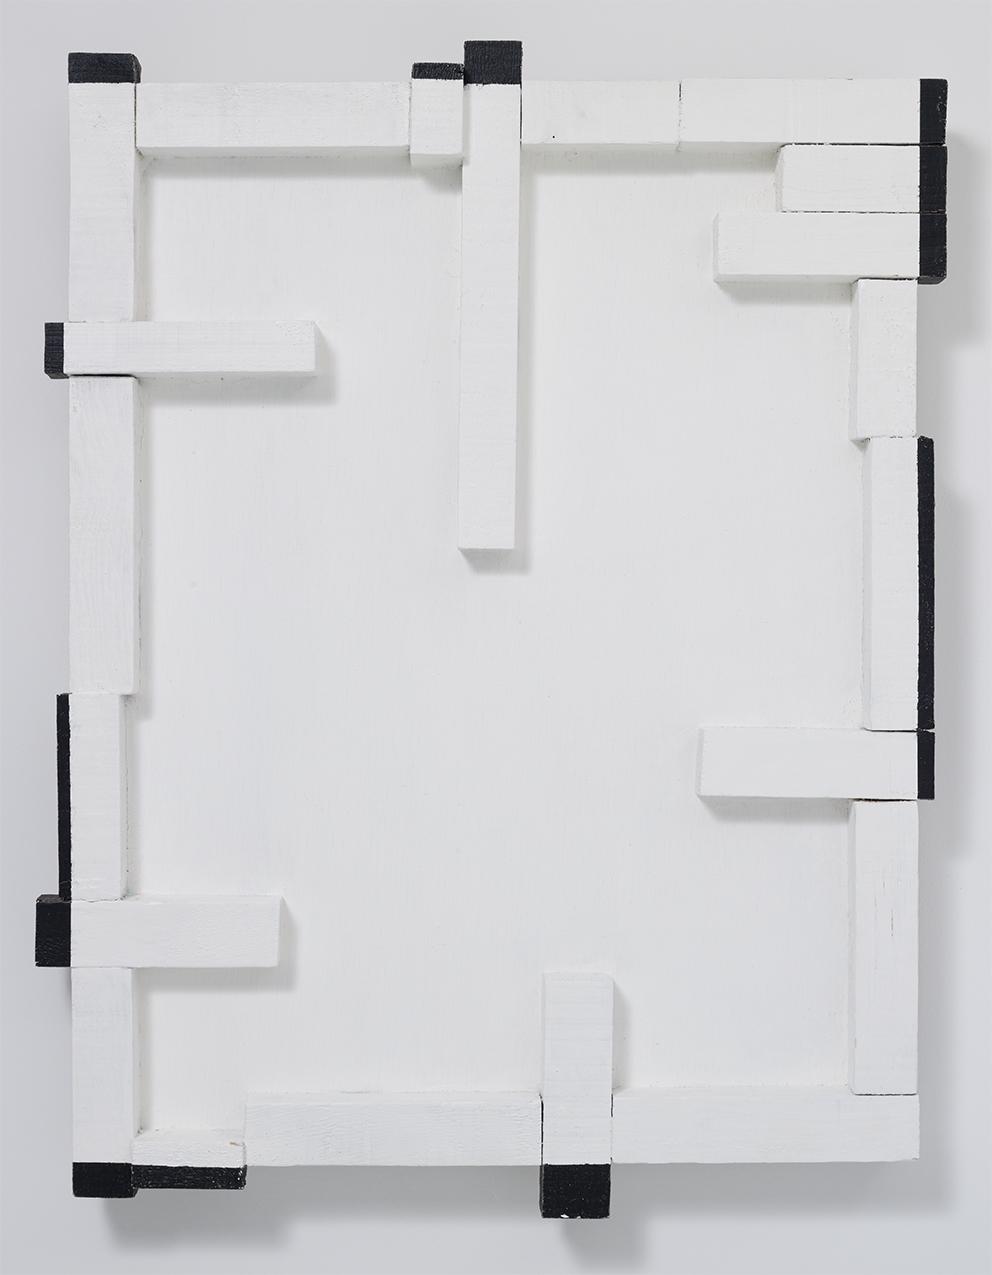 PROTRUSION-88D ,1988